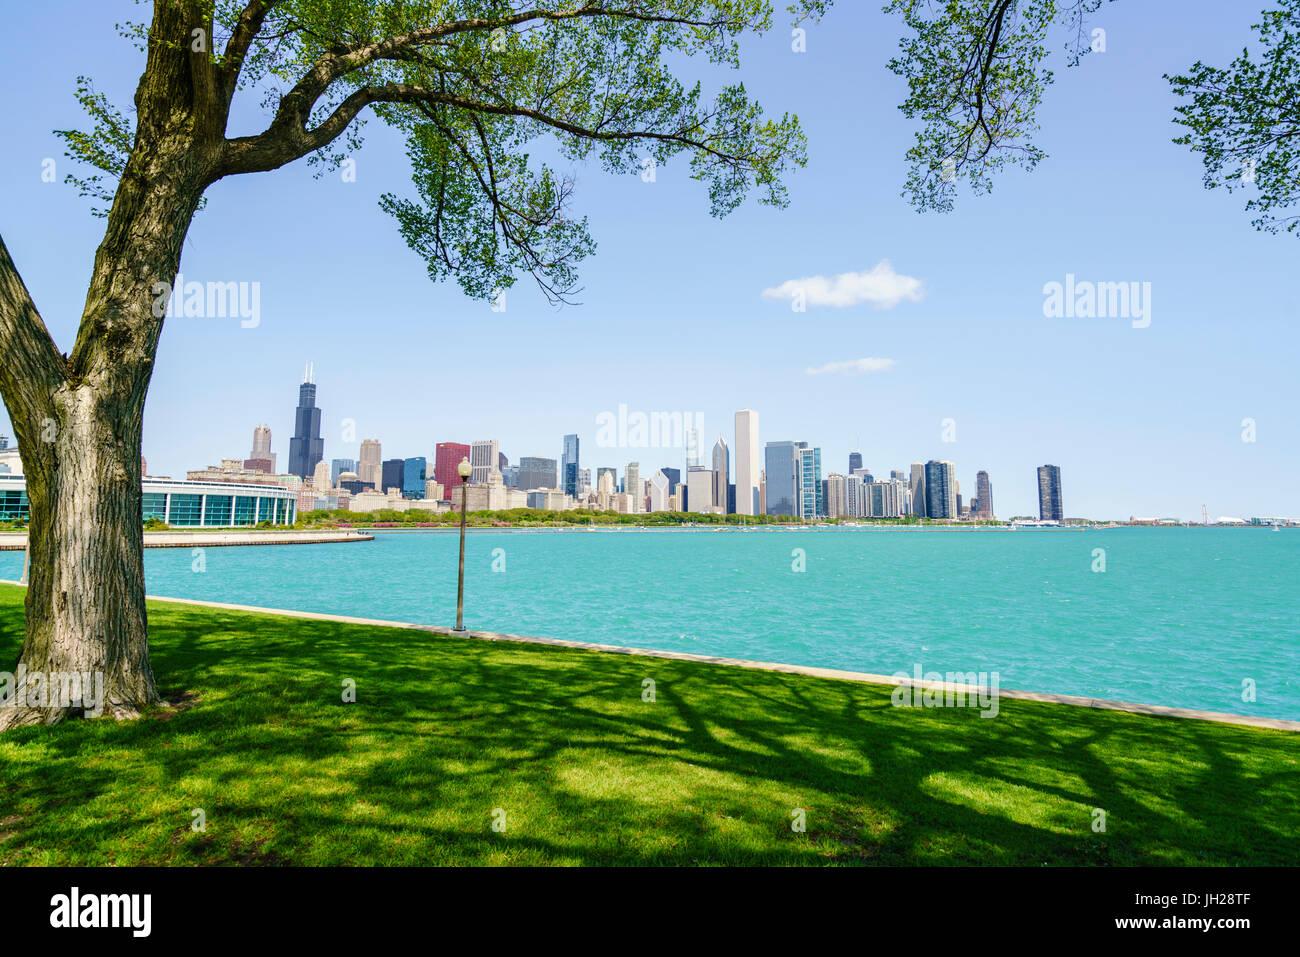 Lake Michigan and city skyline, Chicago, Illinois, United States of America, North America - Stock Image